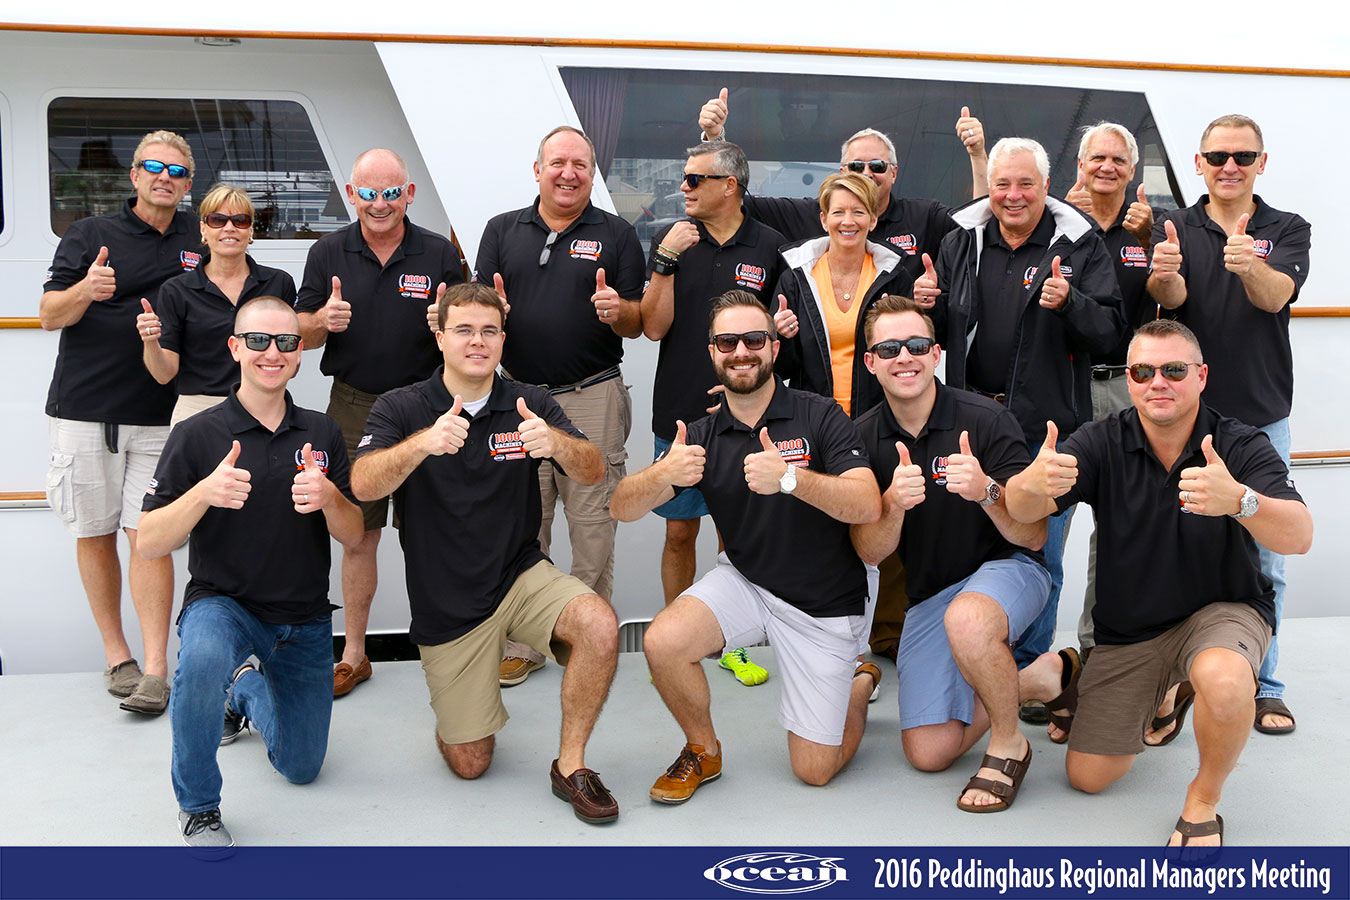 Cruising Intracoastal with Peddinghaus Regional Managers